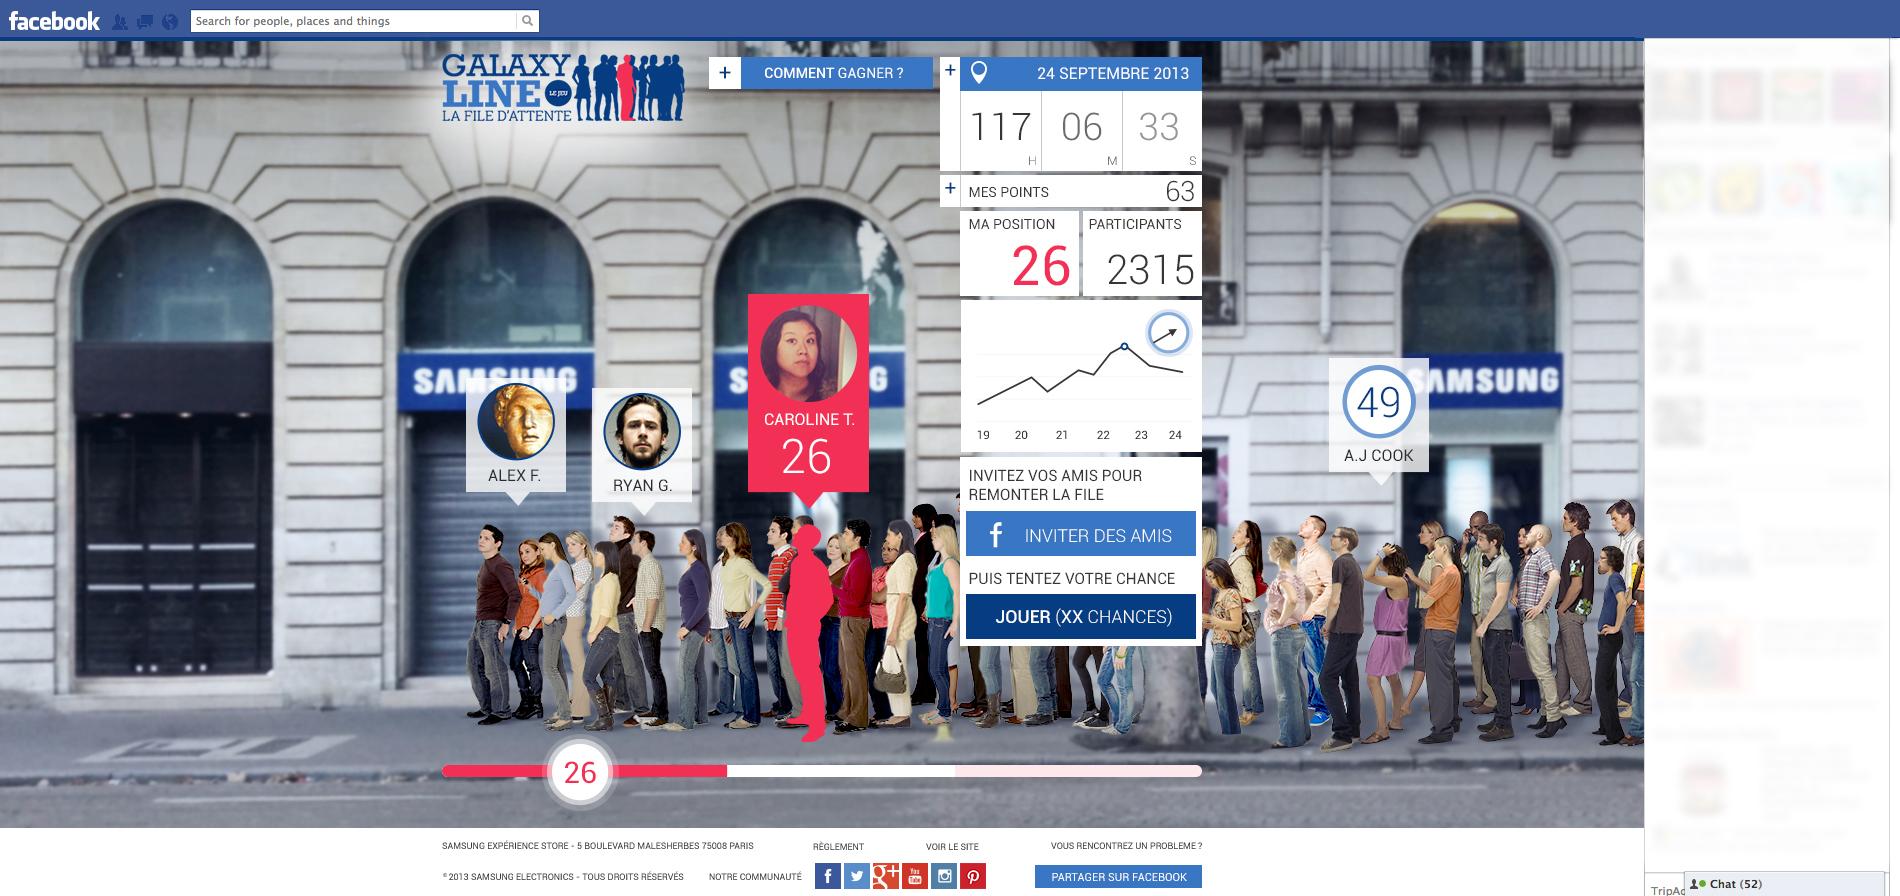 Concours Samsung Galaxy Line : gagnez 50 duos Galaxy Note 3 + Galaxy Gear